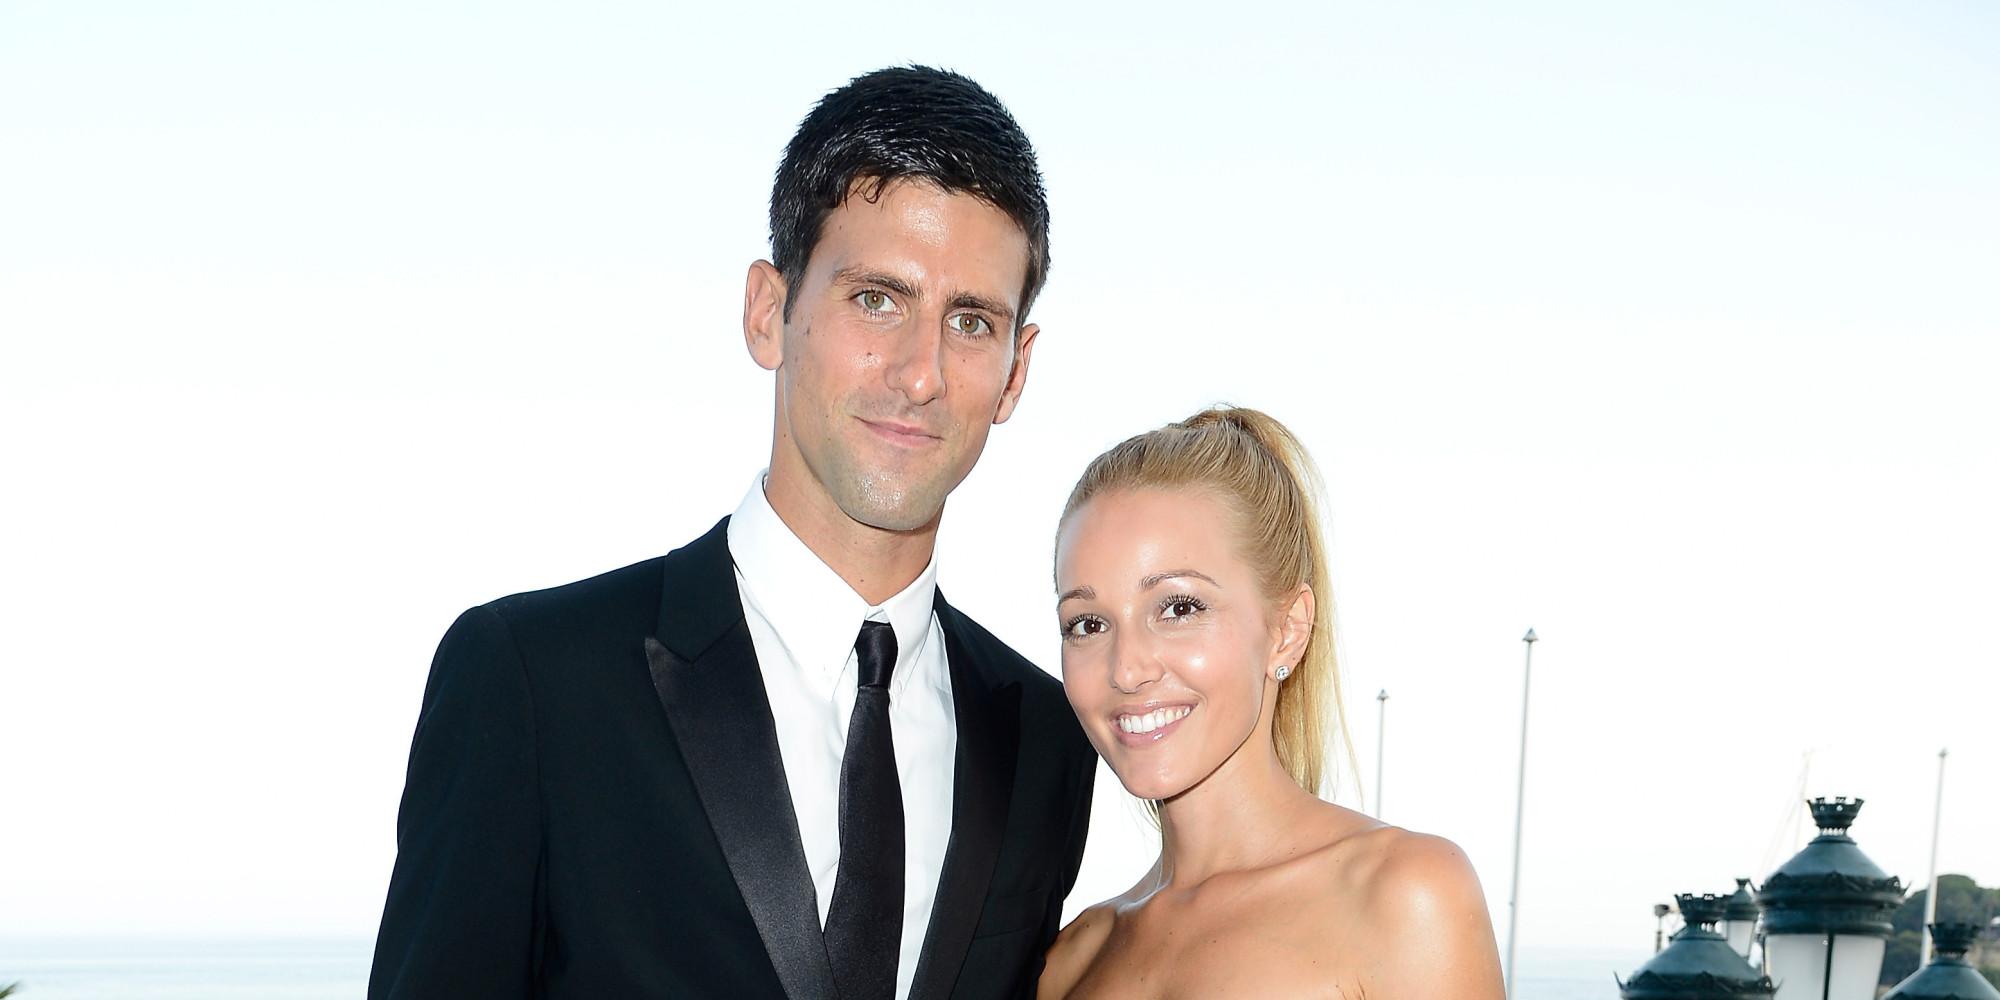 novak djokovic engaged to girlfriend jelena ristic  tennis star shares news on twitter  photo